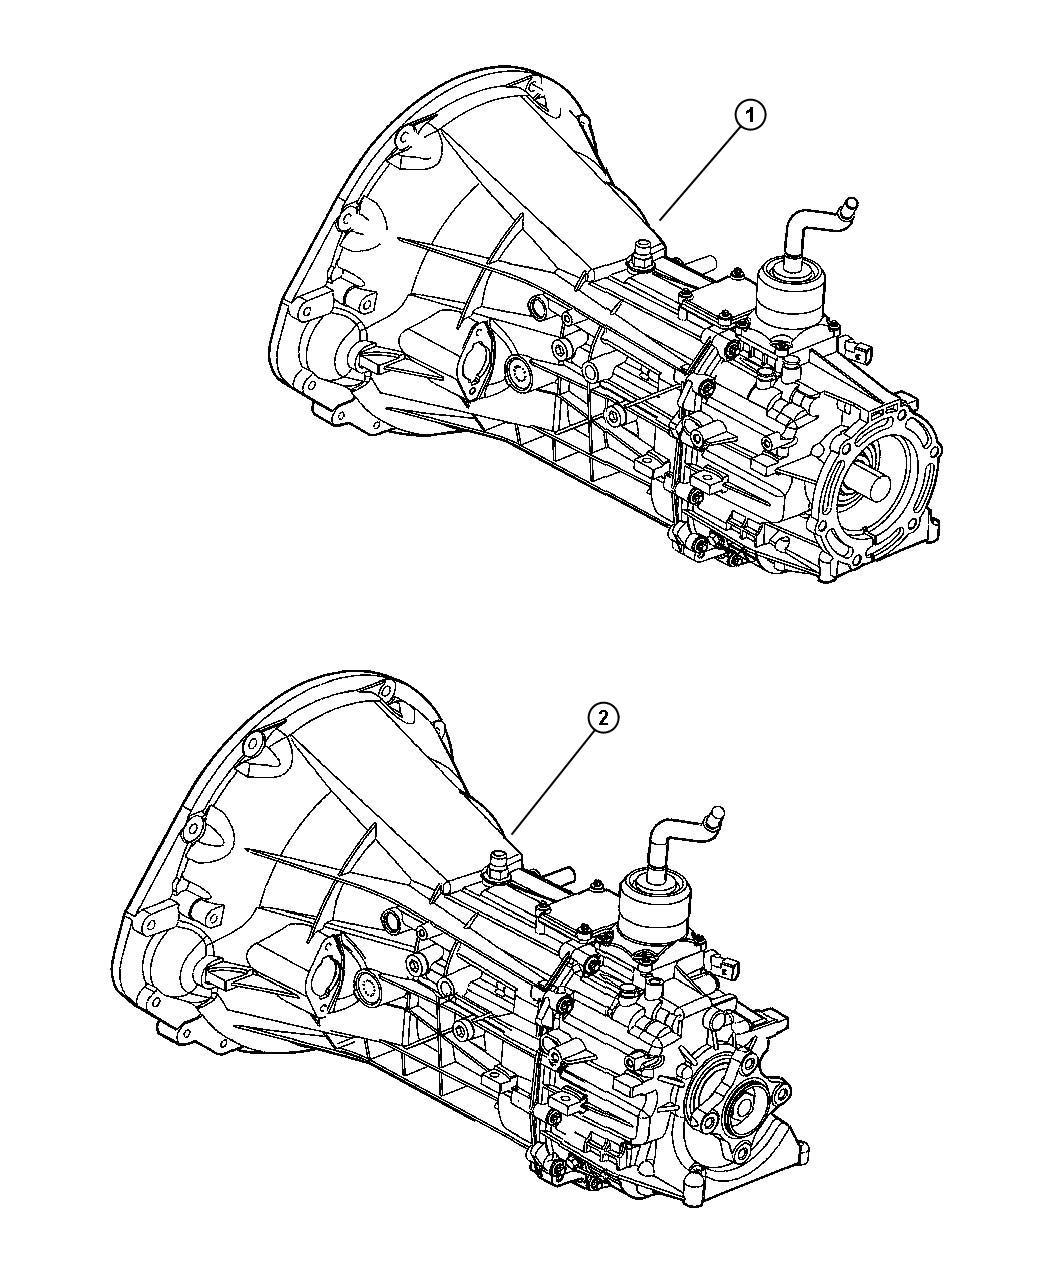 Dodge Dakota Trans 6 Speed 2wd Transmission Assembly